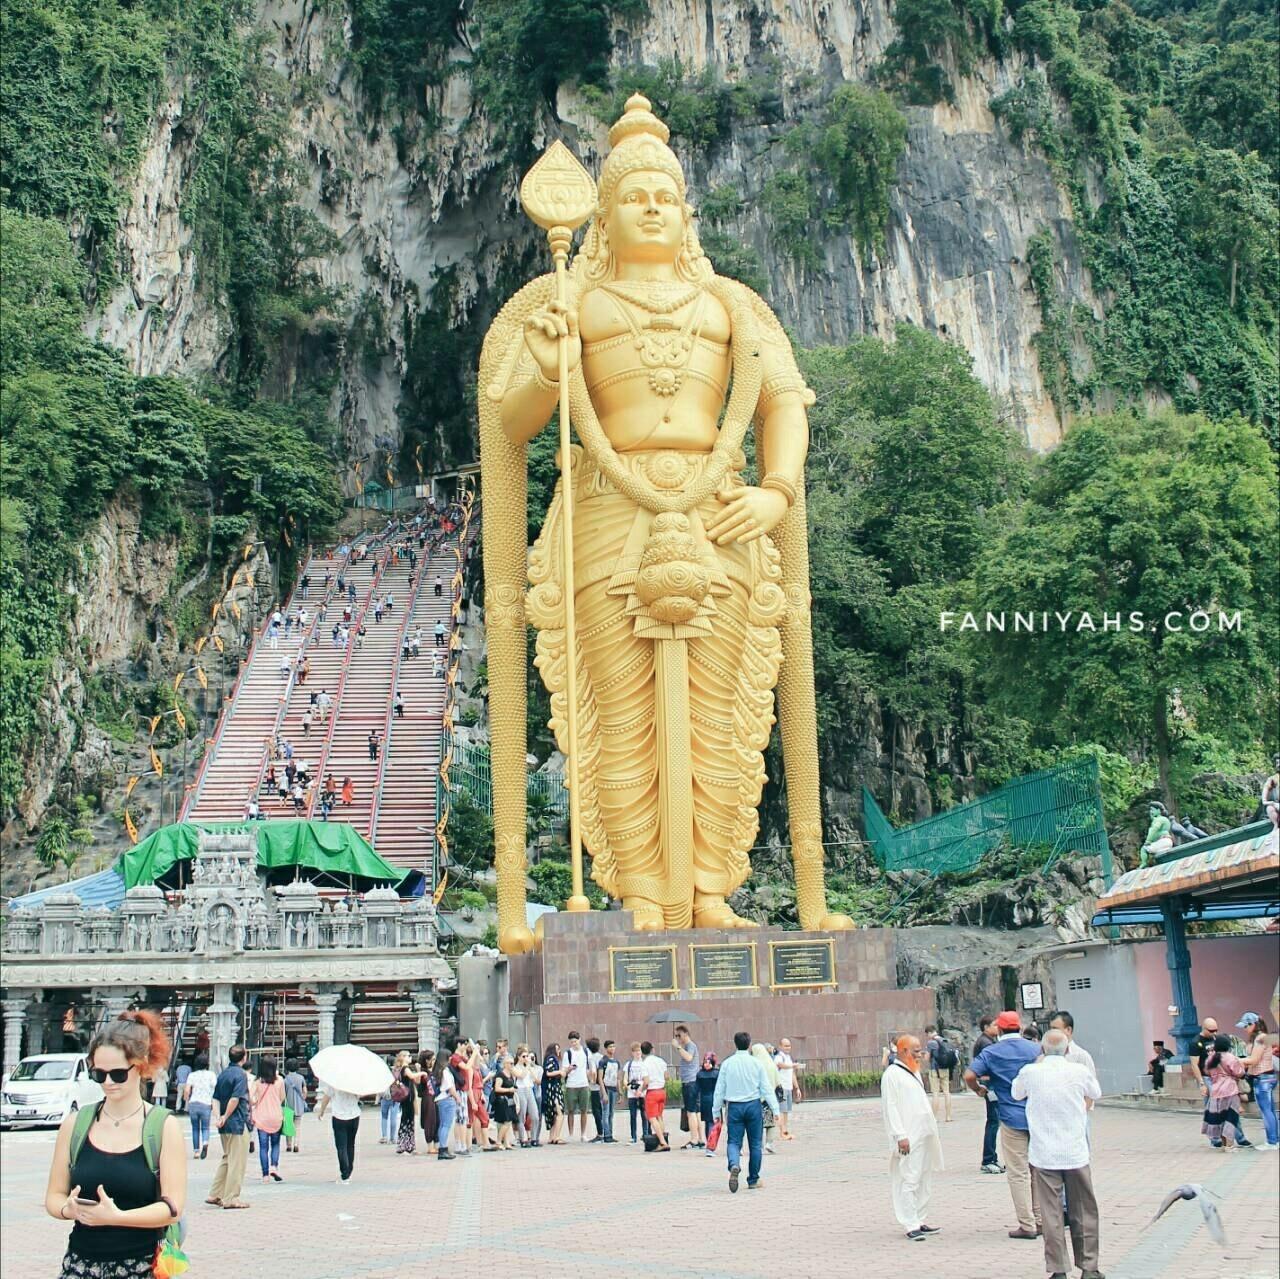 tempat-wisata-di-kuala-lumpur-tempat-wisata-di-malaysia-wisata-kuala-lumpur-wisata-malaysia